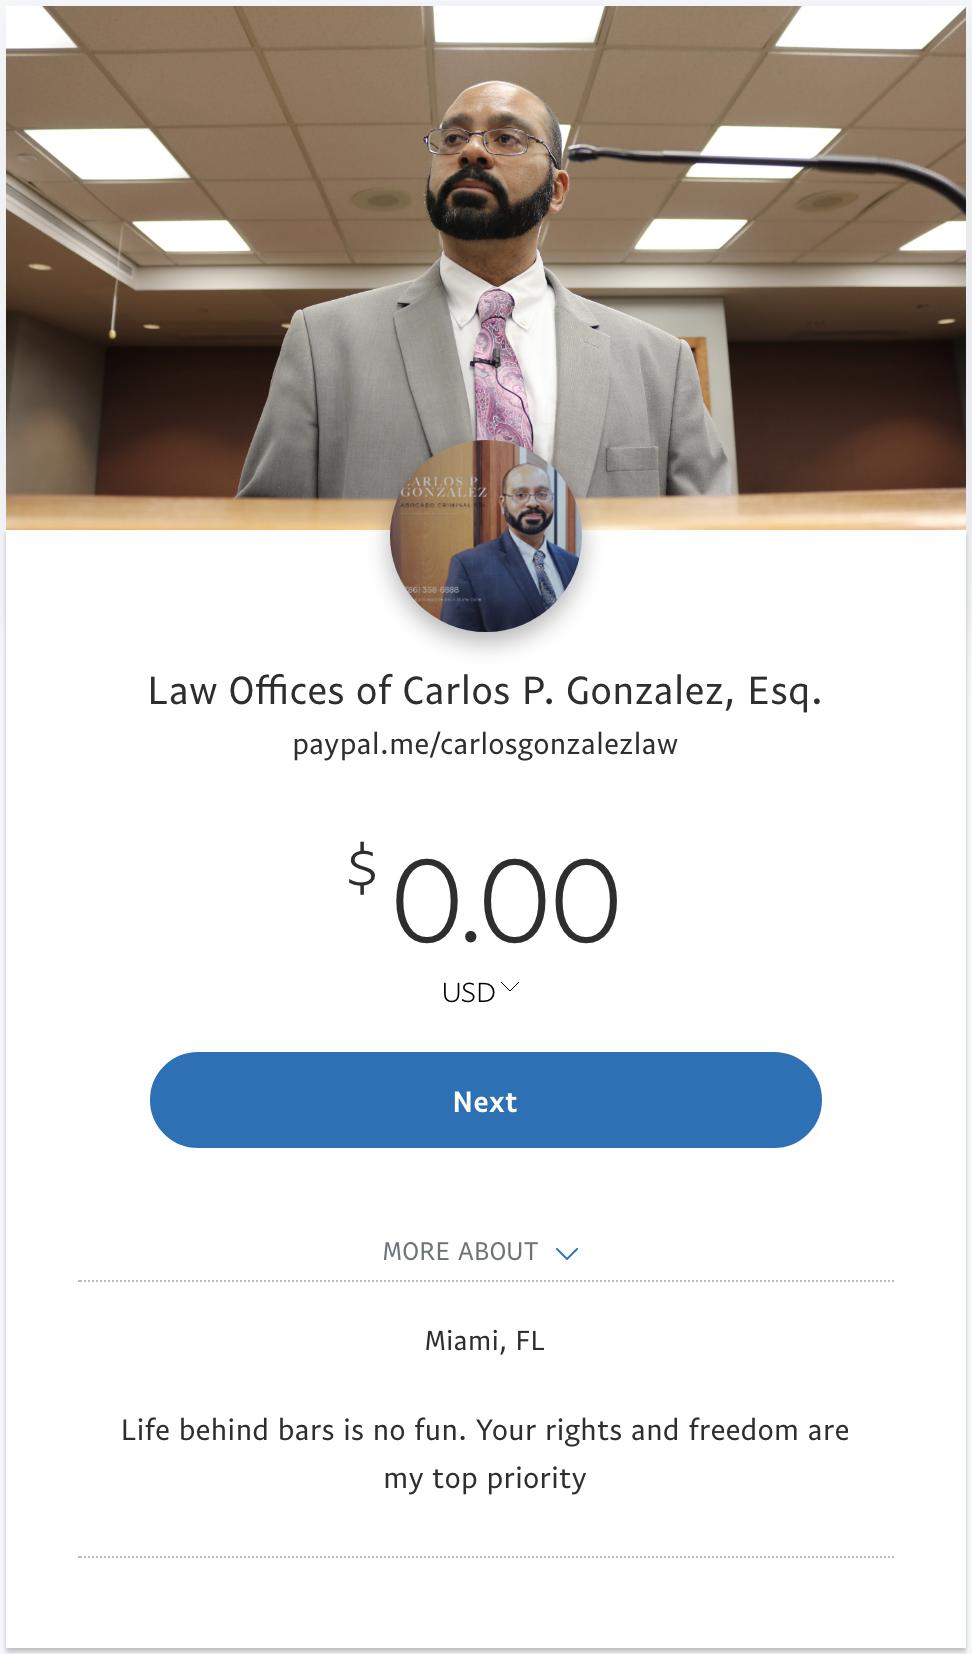 Make a payment PayPal Carlos Gonzalez Law